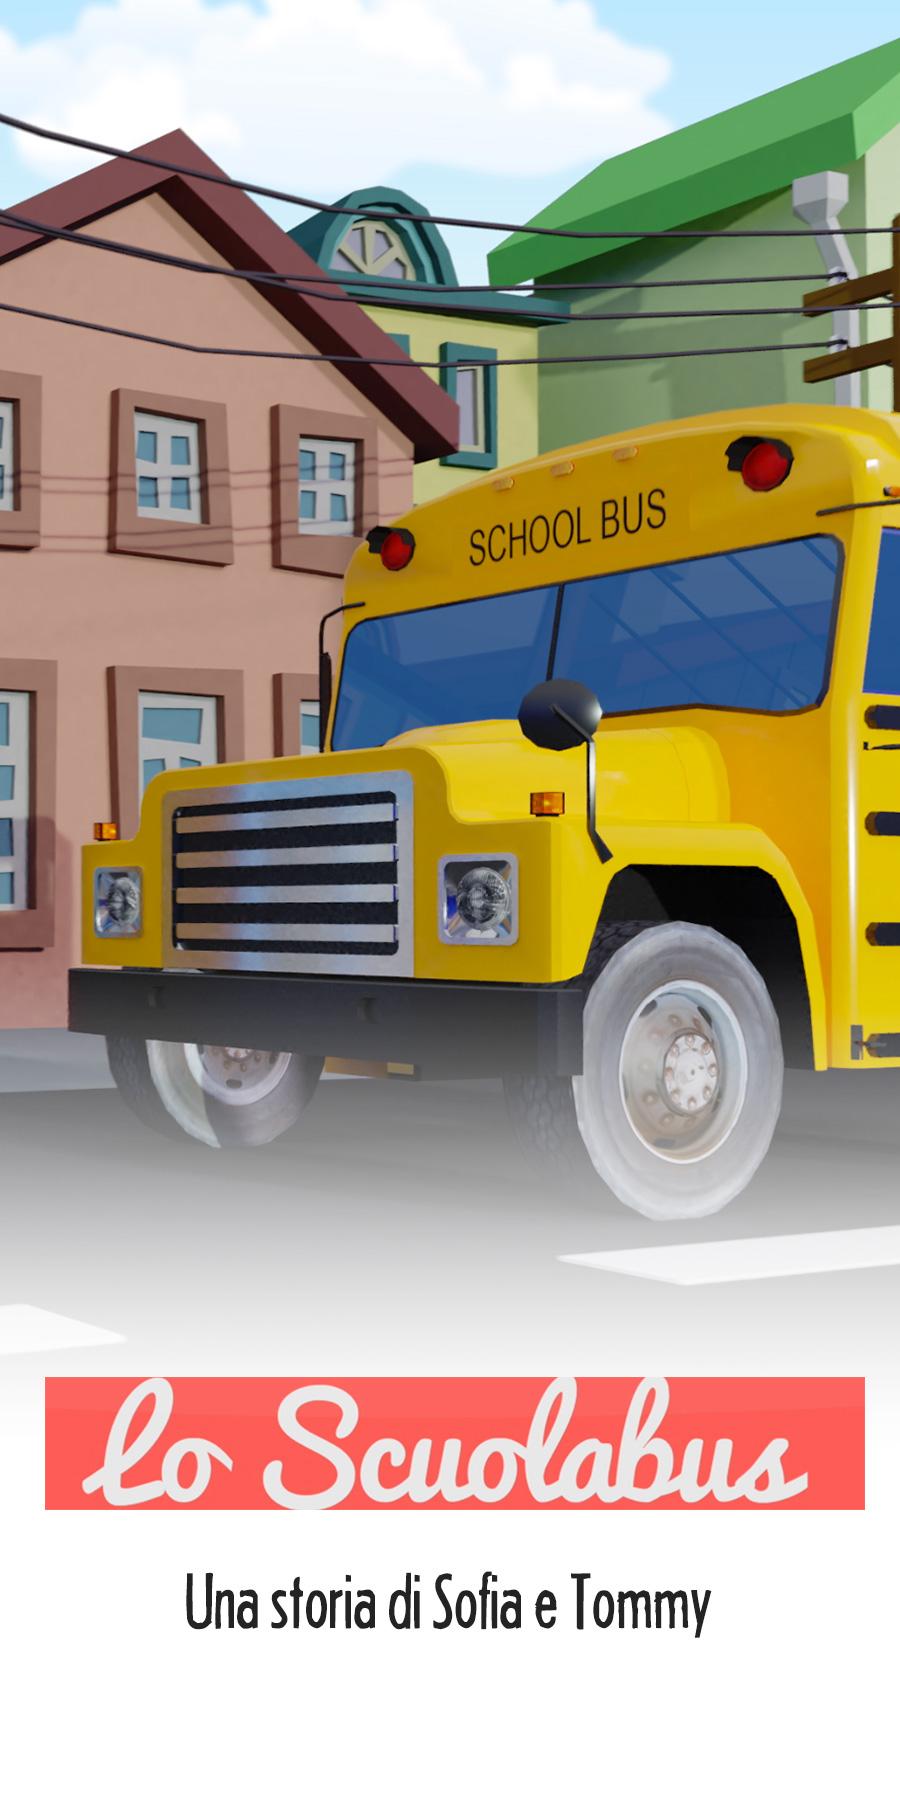 Lo Scuolabus